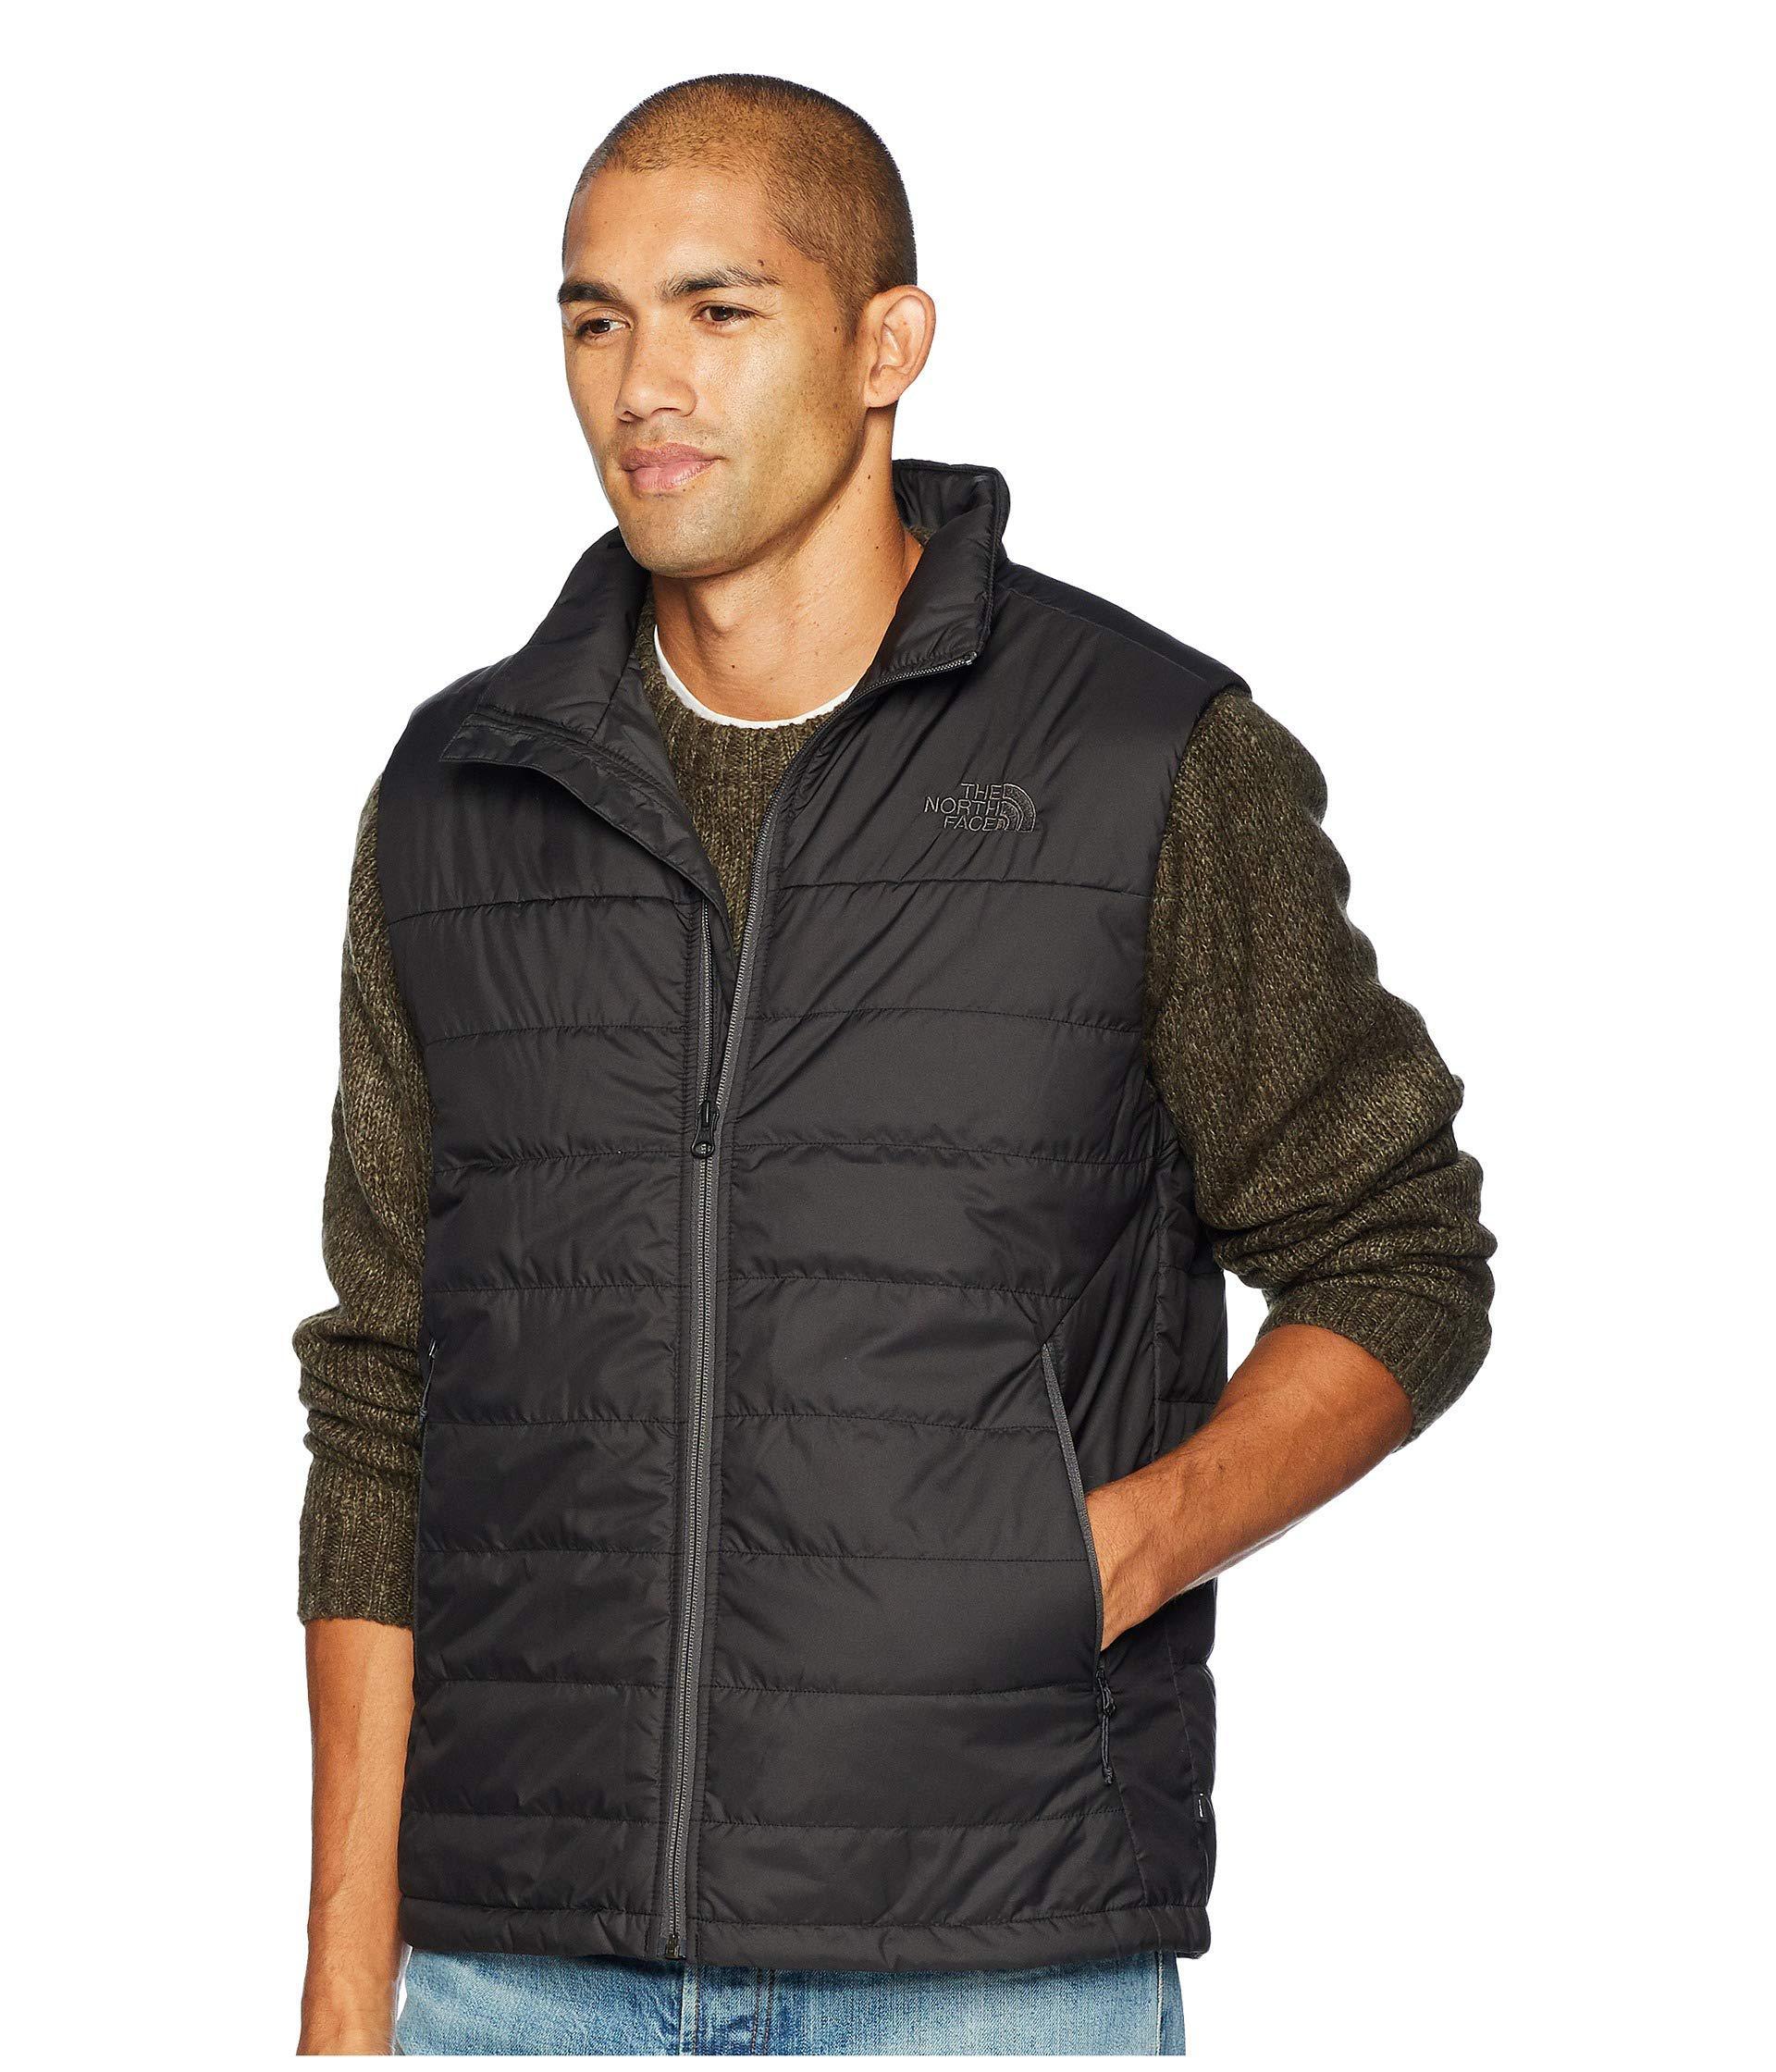 Lyst - The North Face Bombay Vest (tnf Black) Men s Vest in Black for Men 42da1d079